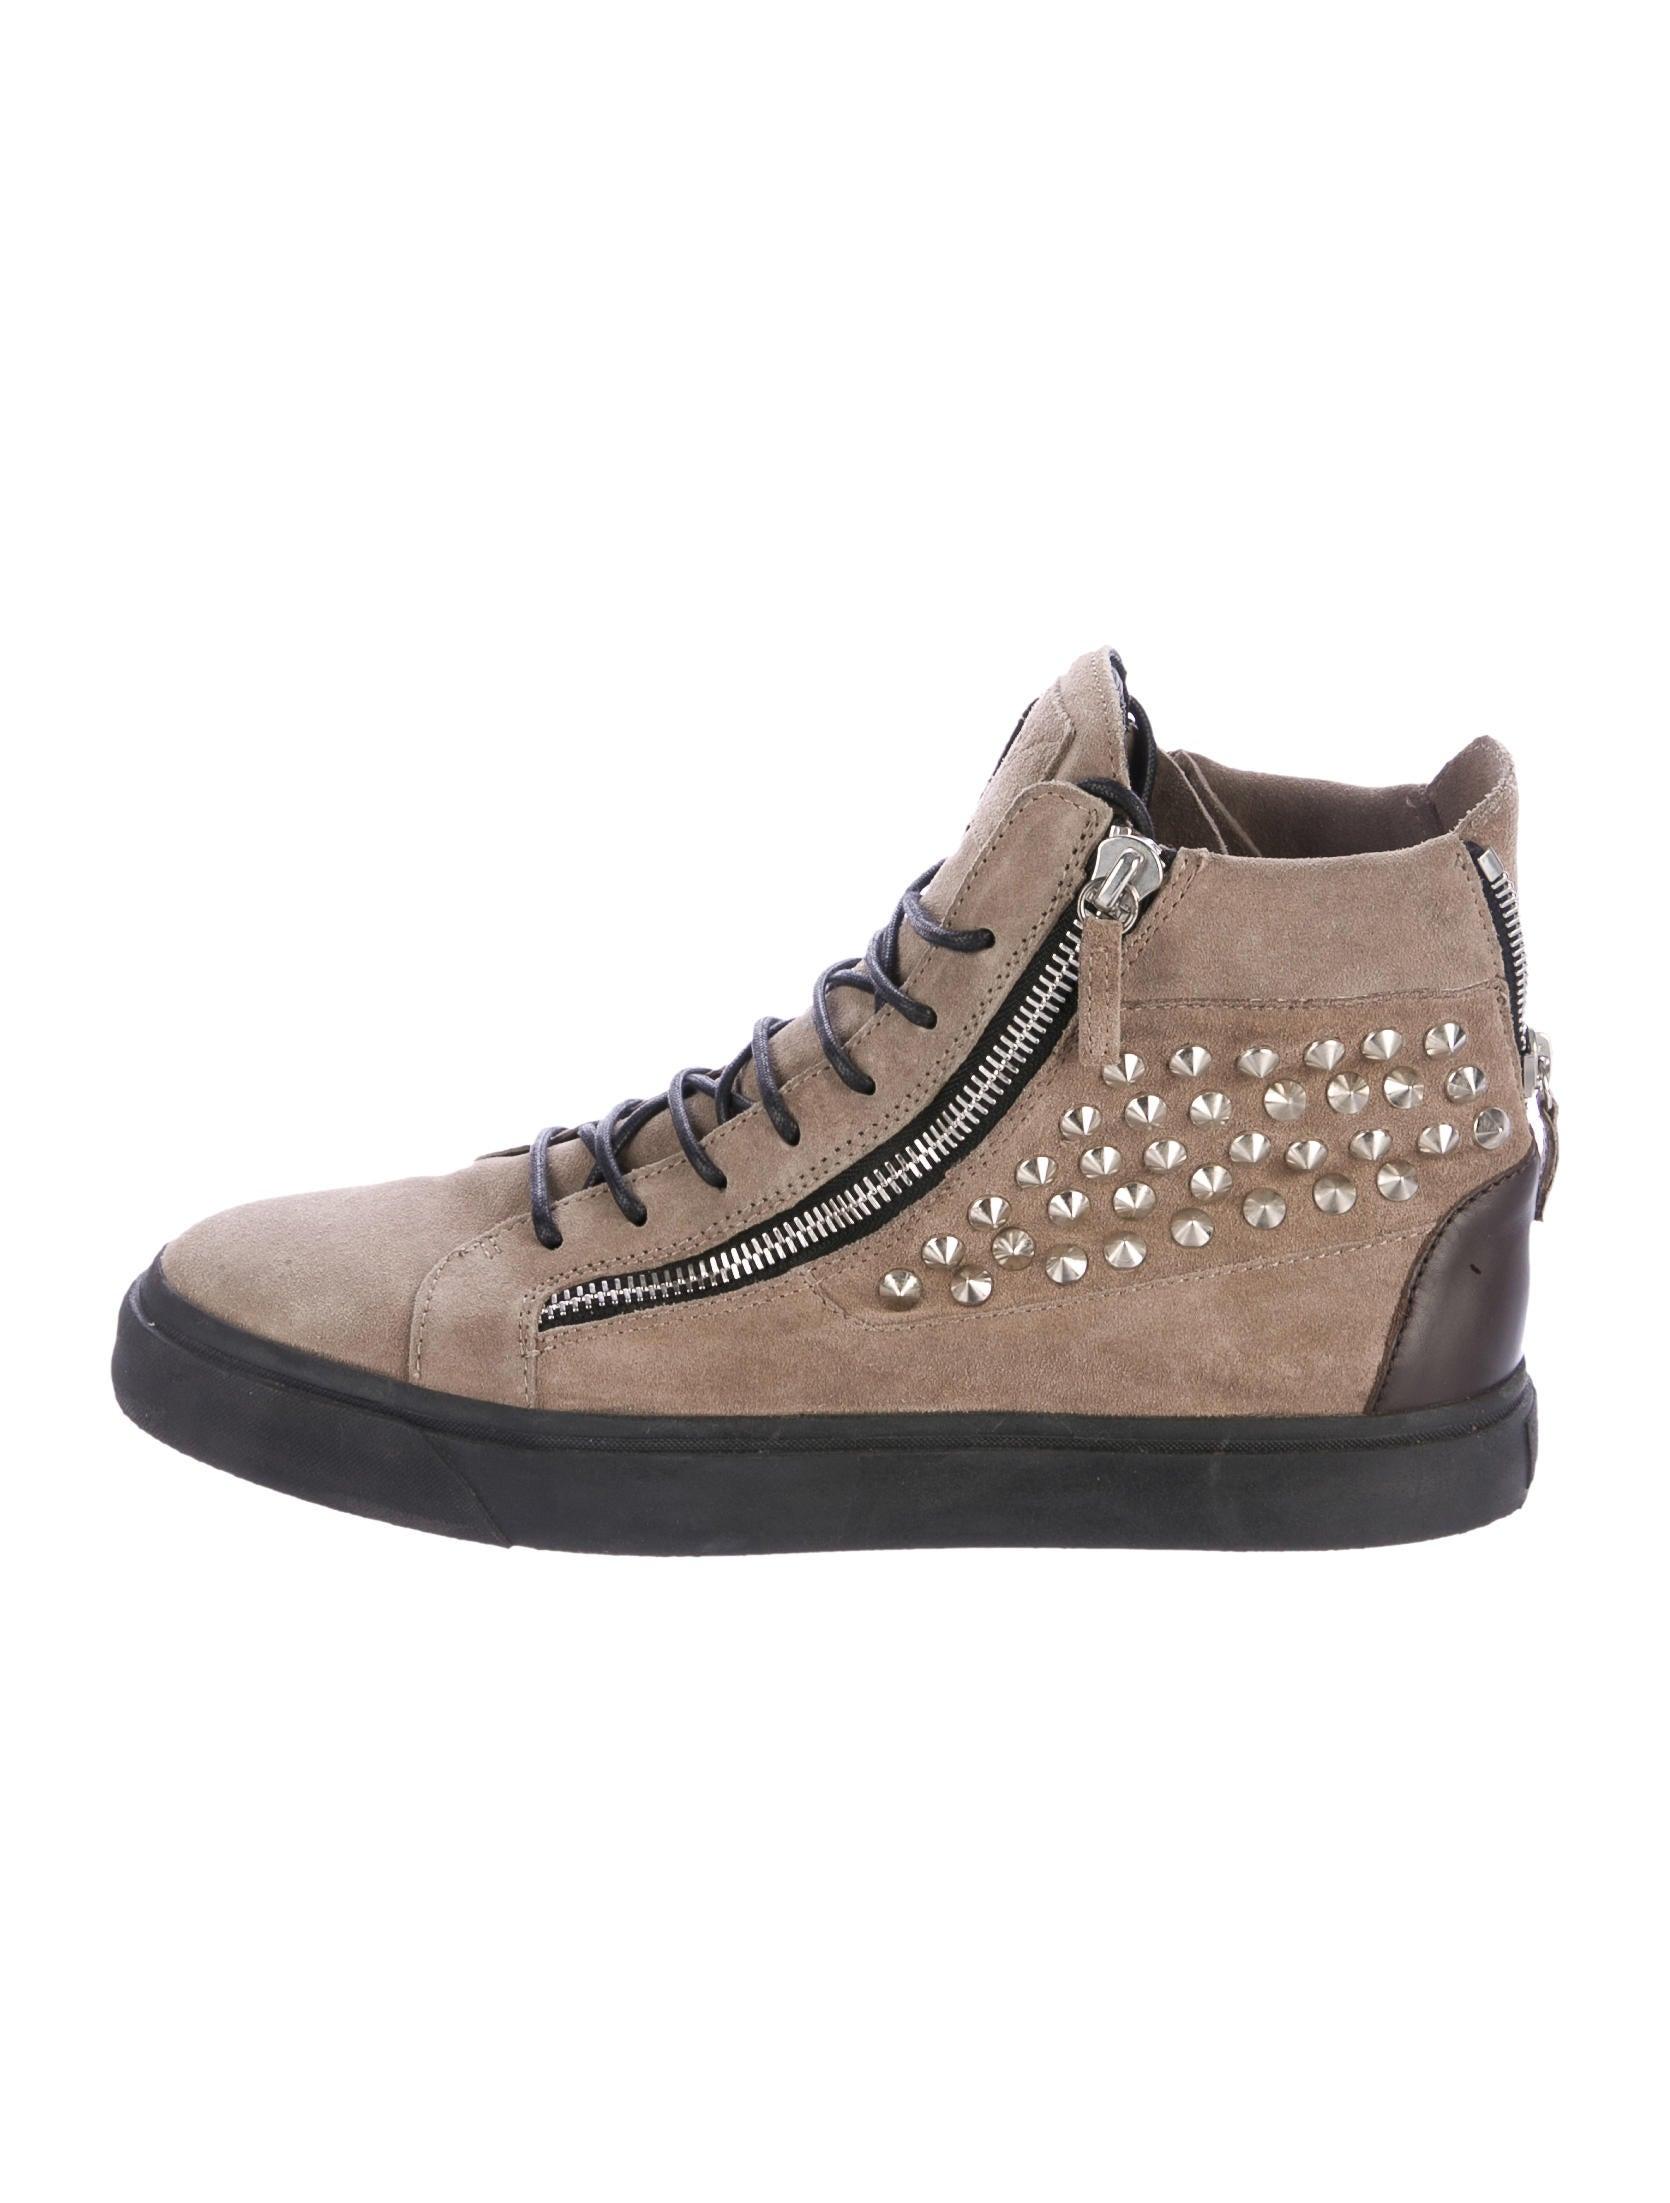 Giuseppe Zanotti Suede Spiked Sneakers Shoes Giu39539